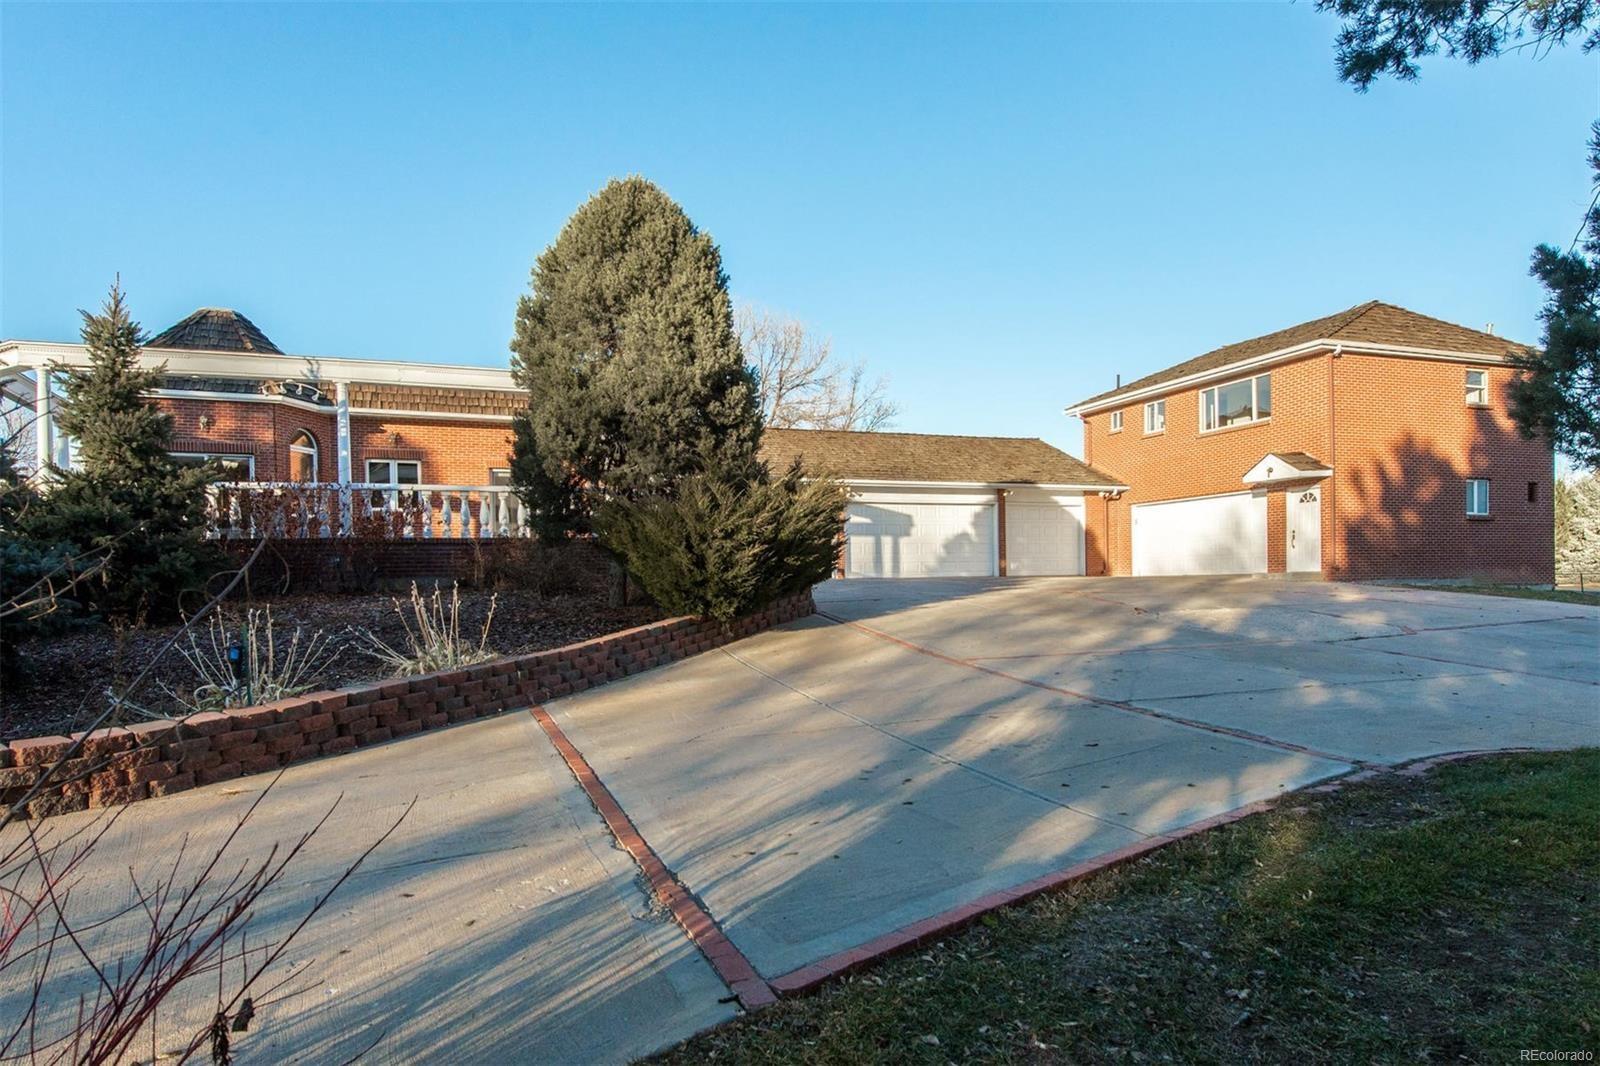 MLS# 8089183 - 1 - 10  Sunrise Drive, Cherry Hills Village, CO 80113